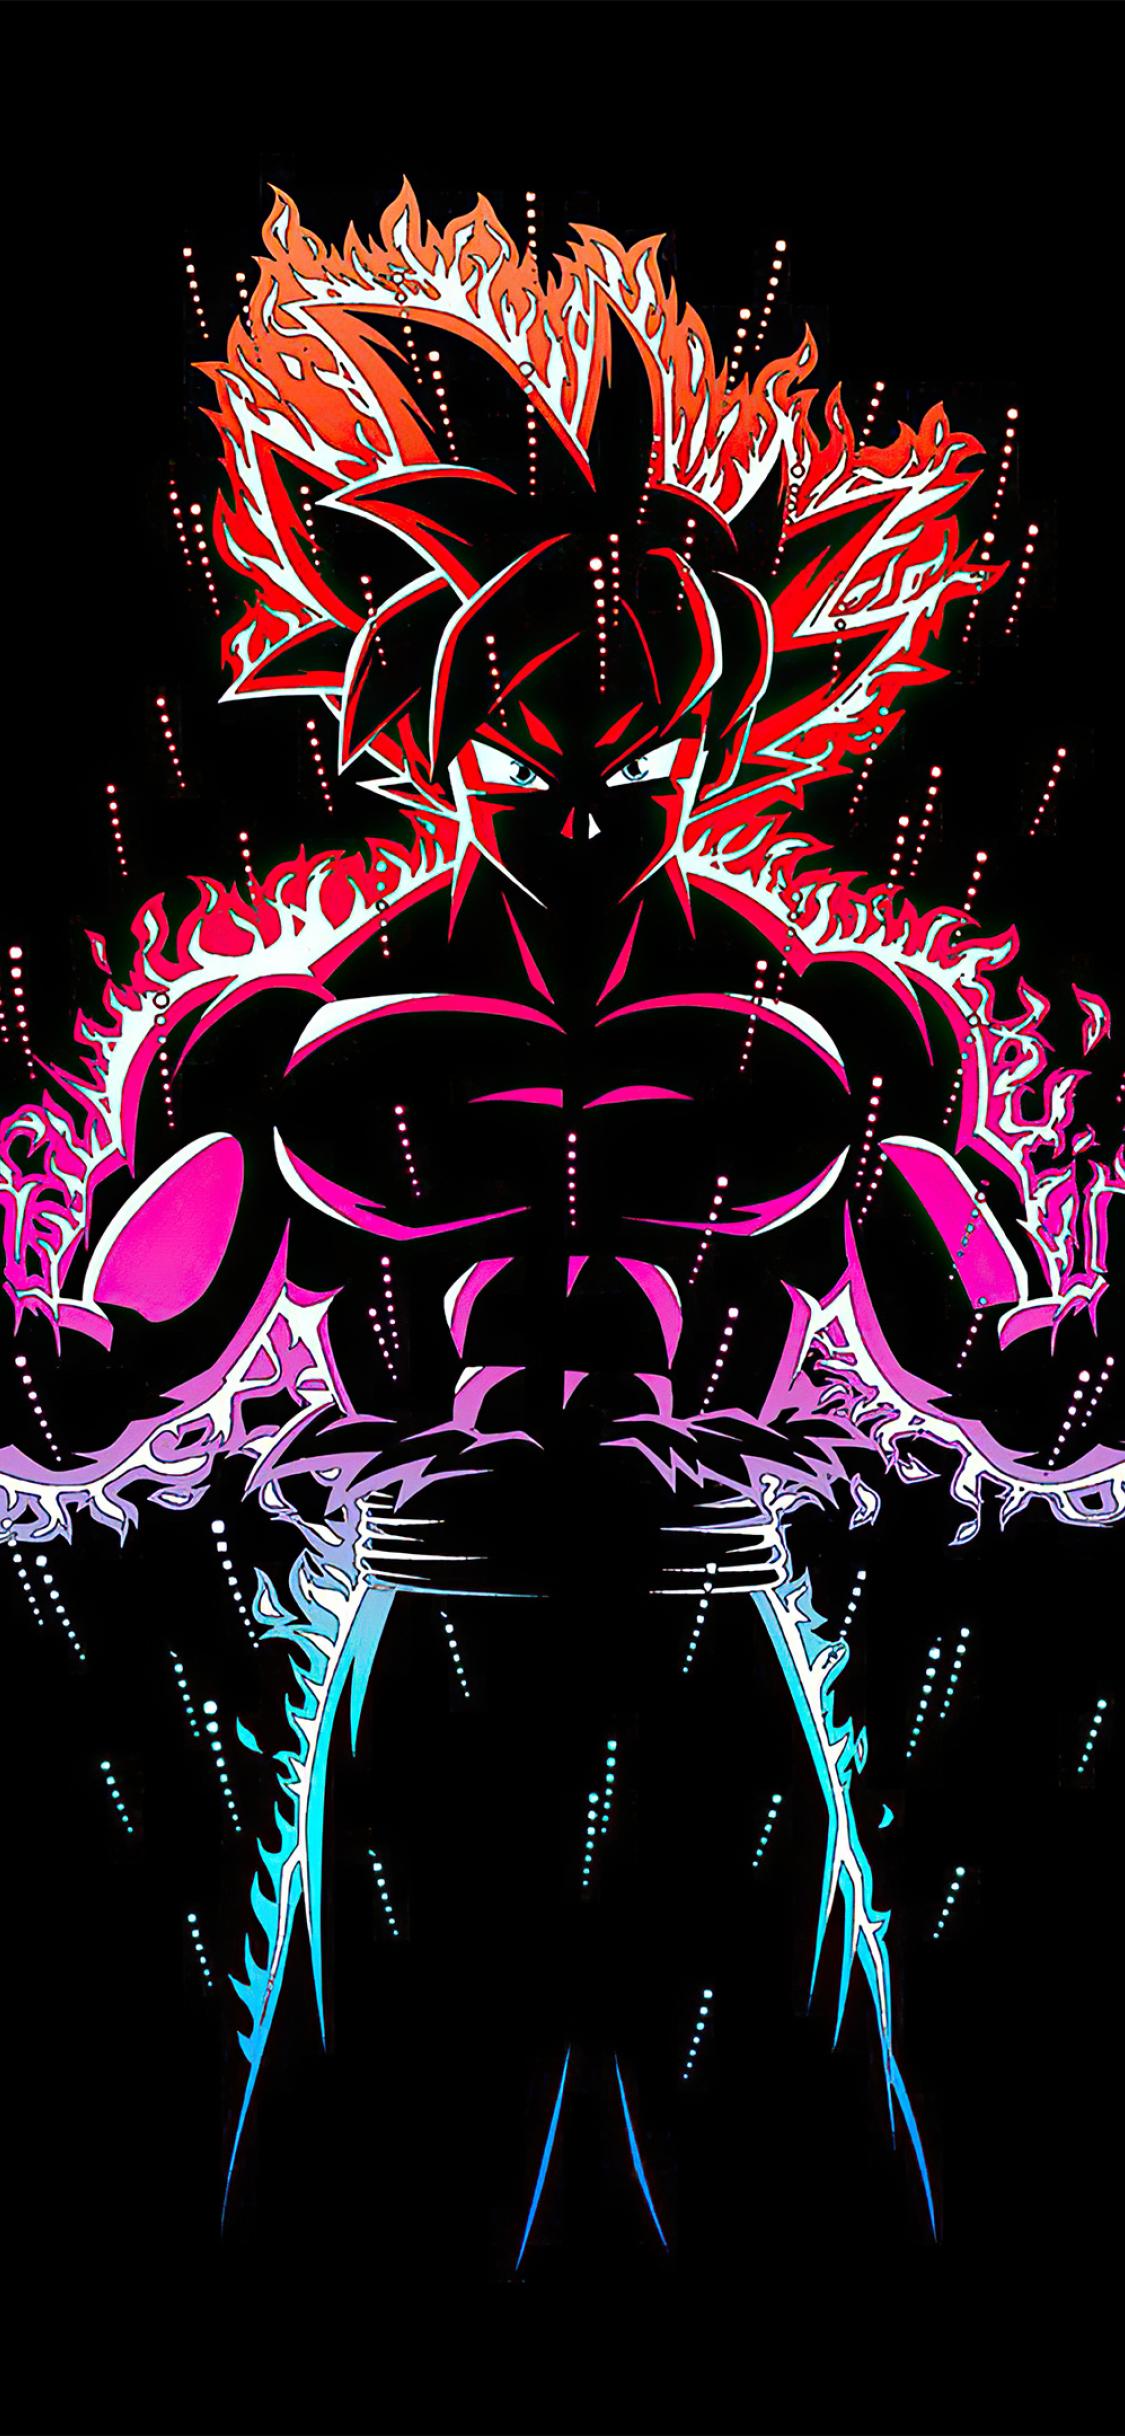 1125x2436 Dragon Ball Z Goku Ultra Instinct Fire Iphone XS ...